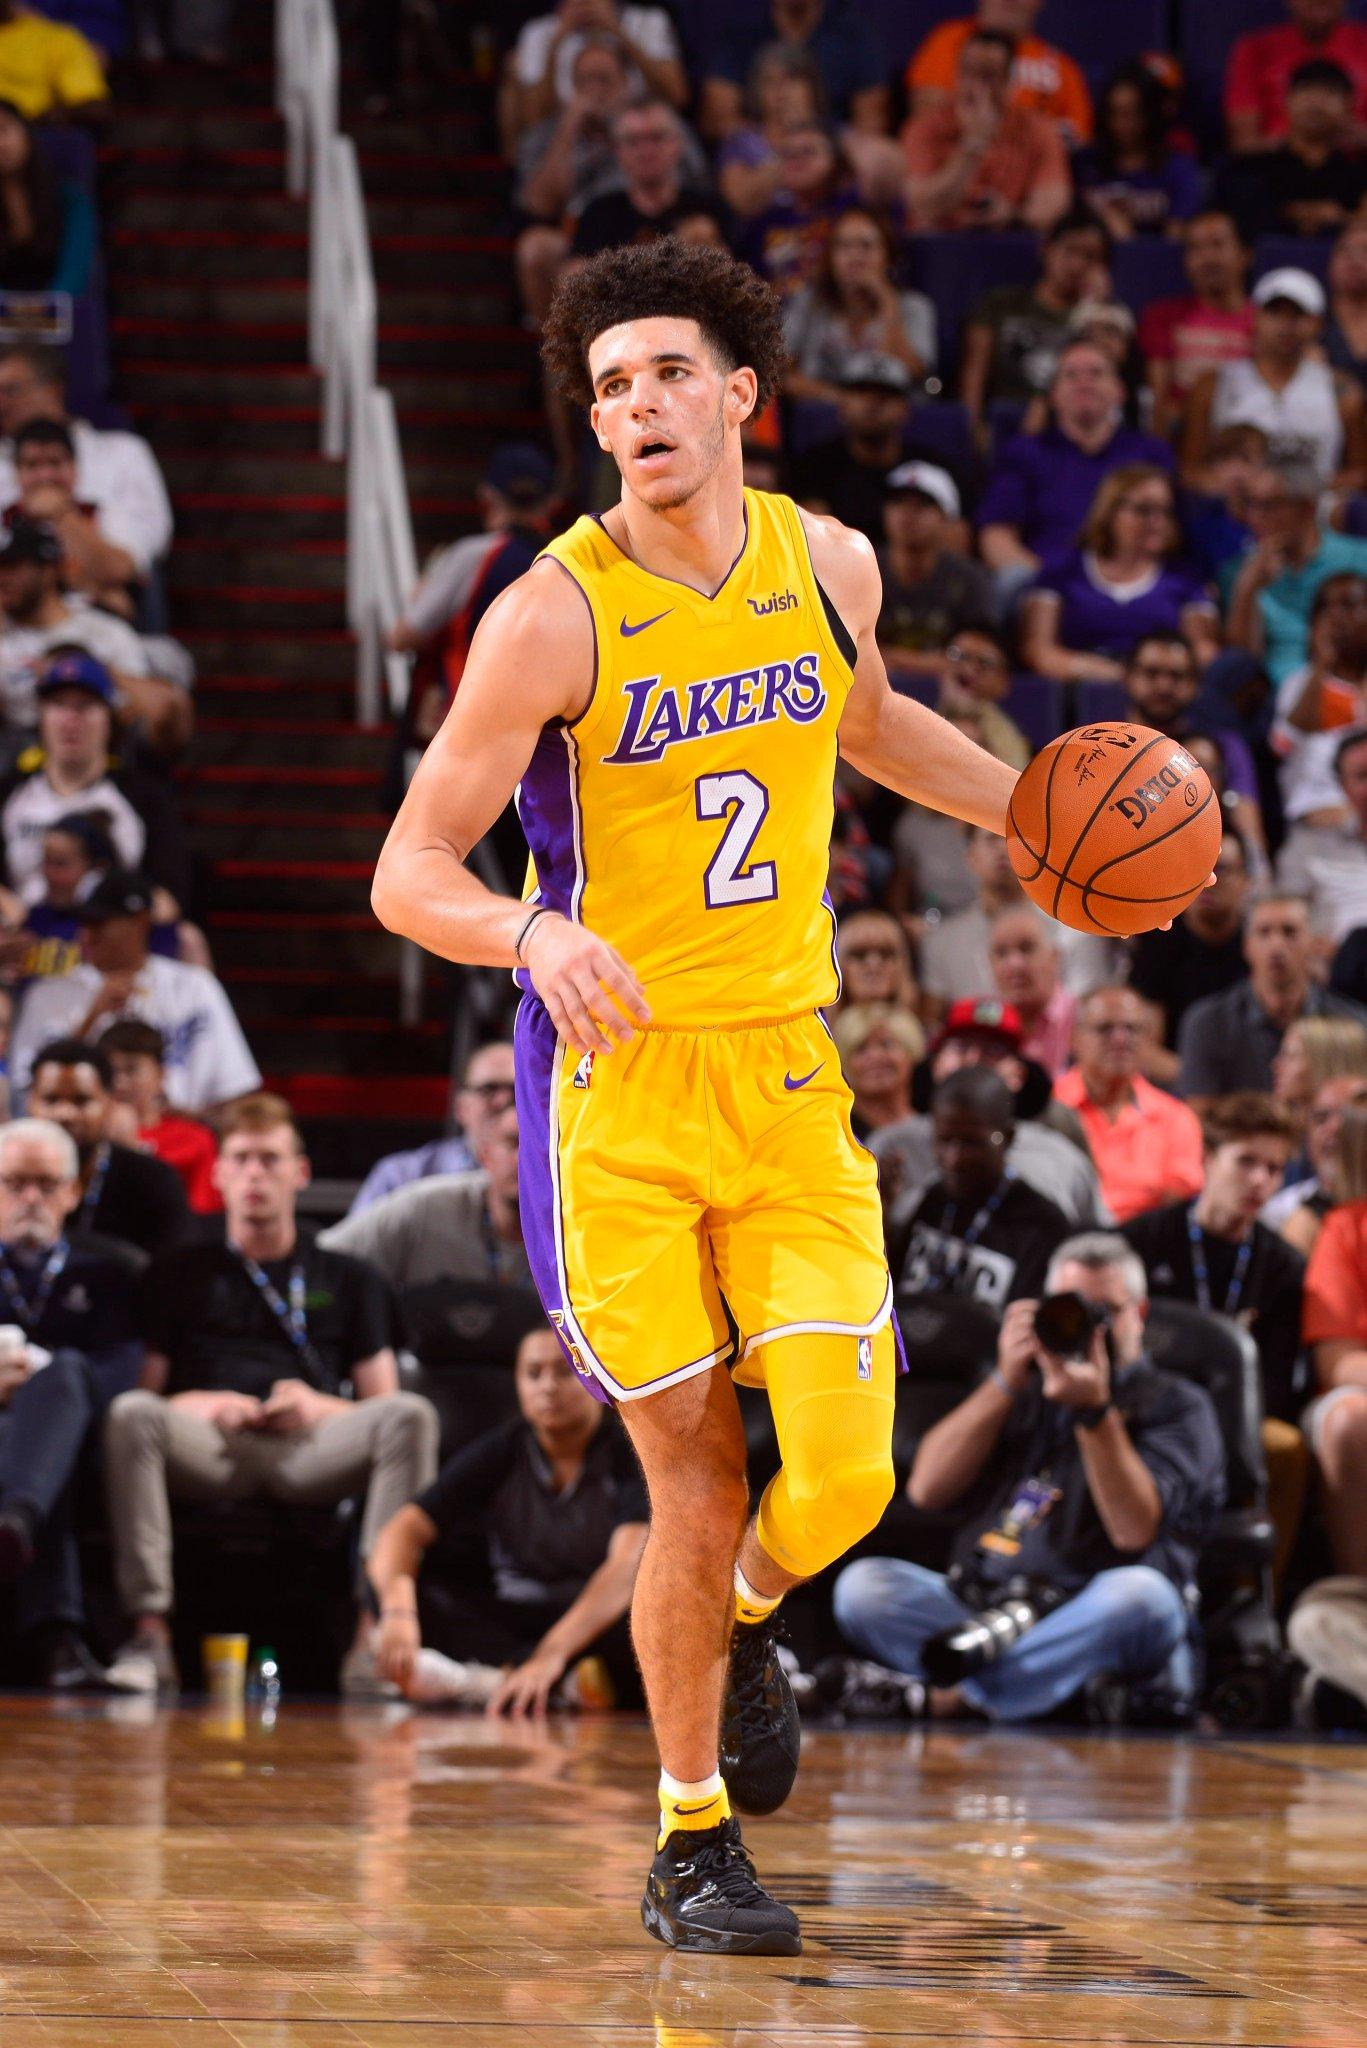 Lonzo Ball's 2nd game as a @NBA player:  29 PTS - 11 REBS - 9 ASTS  #NBARooks https://t.co/NRajinxbsi